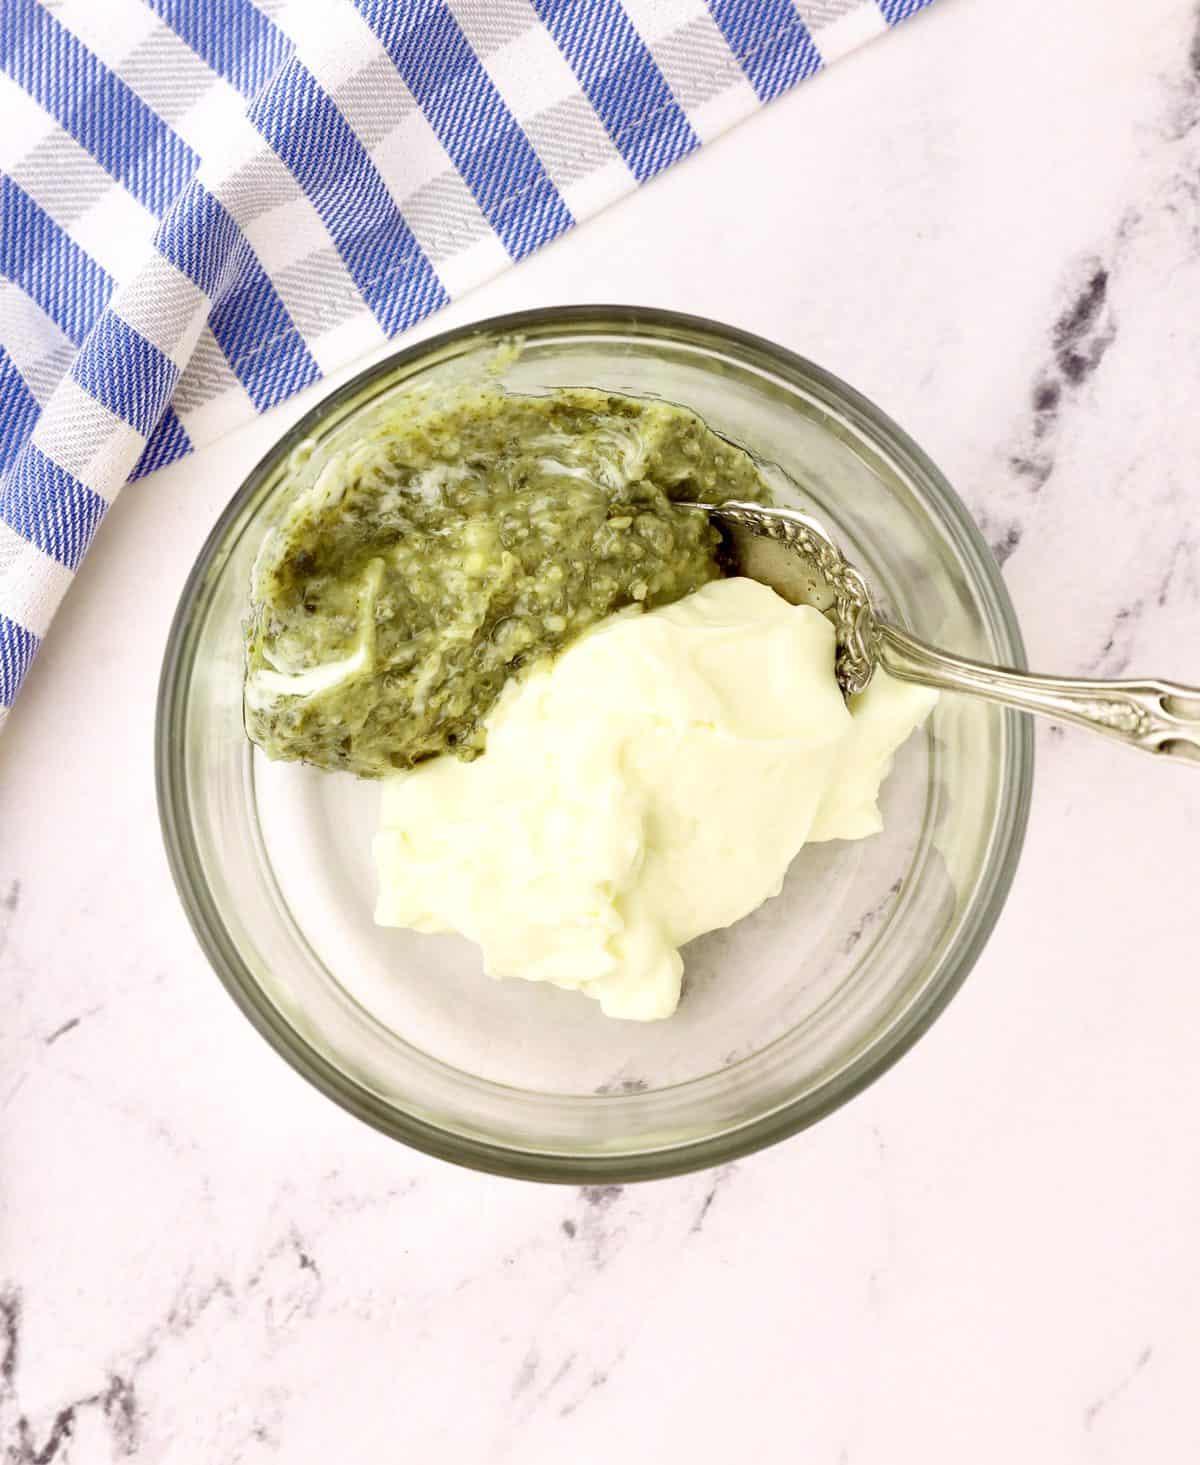 Basil pesto and mayonnaise in a small glass dish.